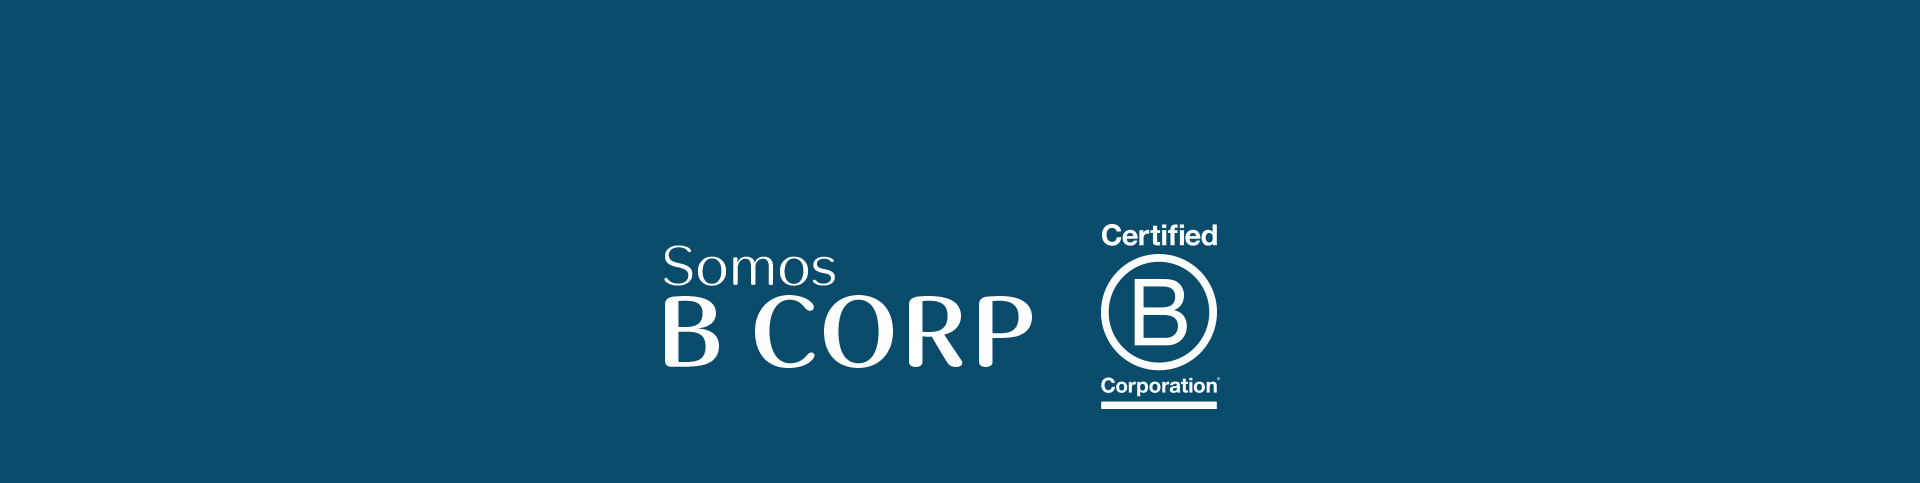 Isologotipo del certificado B Corp